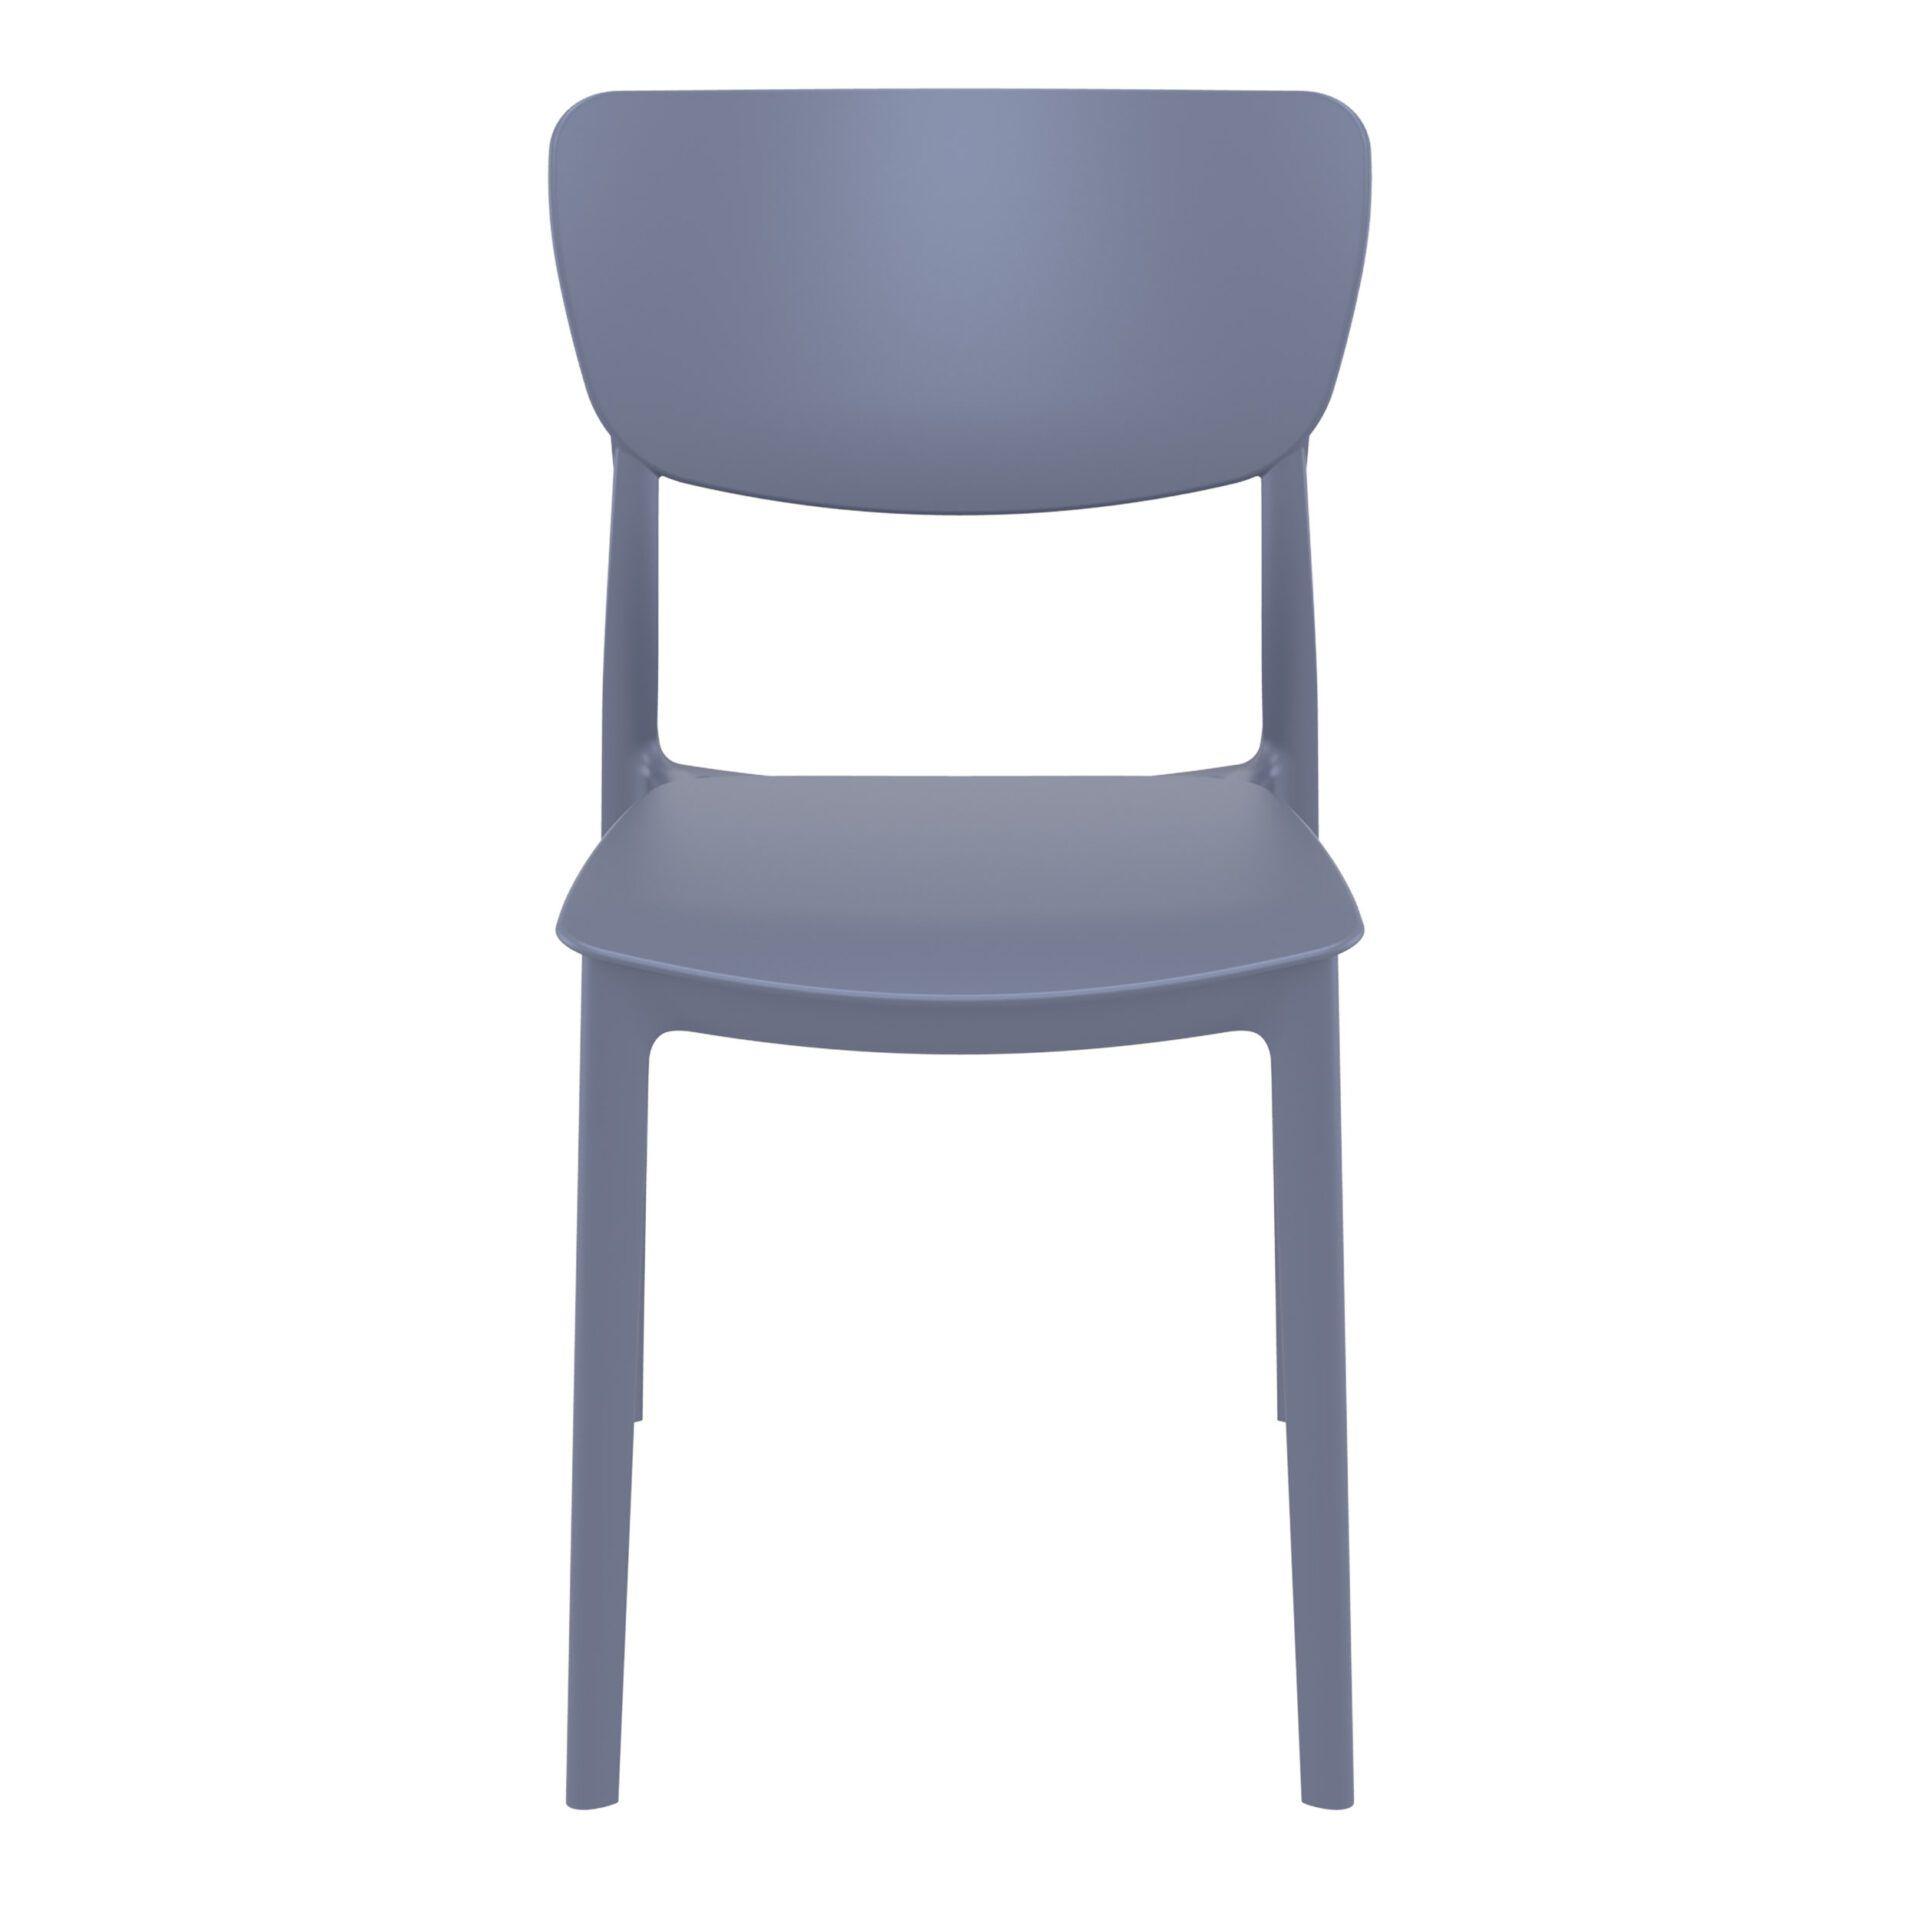 polypropylene outdoor dining monna chair darkgrey front